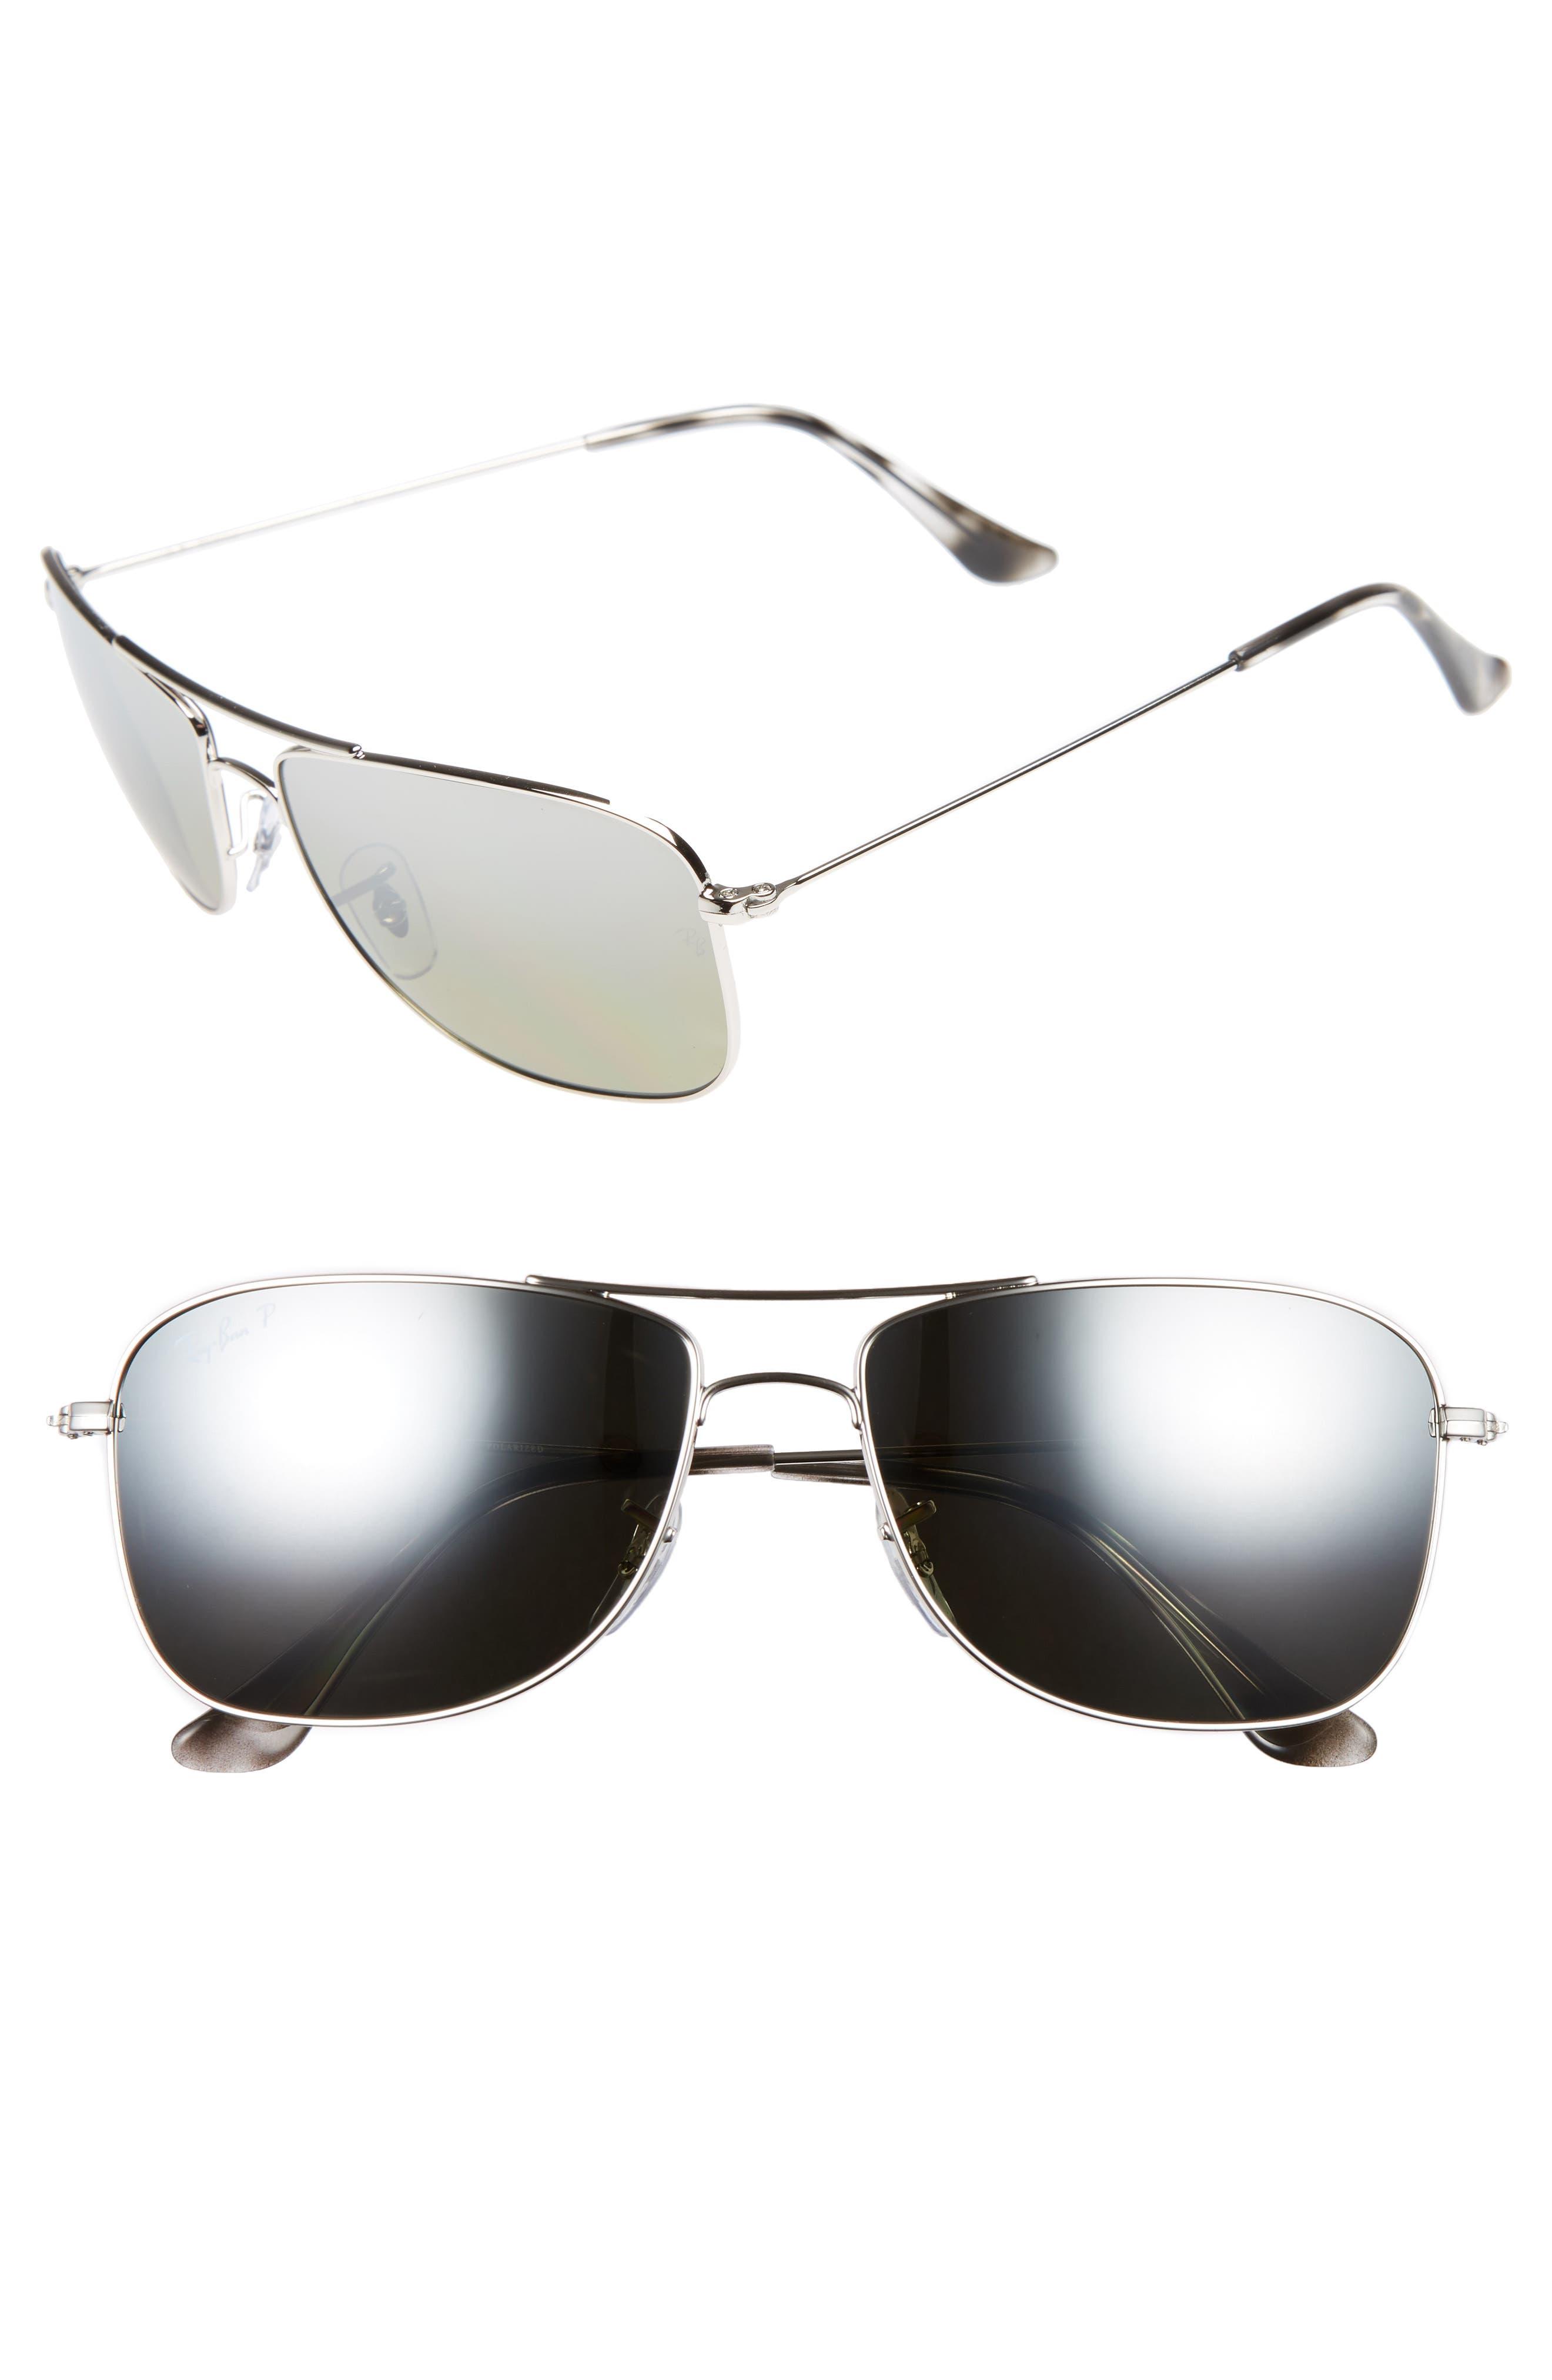 59mm Chromance Aviator Sunglasses,                             Alternate thumbnail 2, color,                             SHINY SILVER/GREY MIRROR